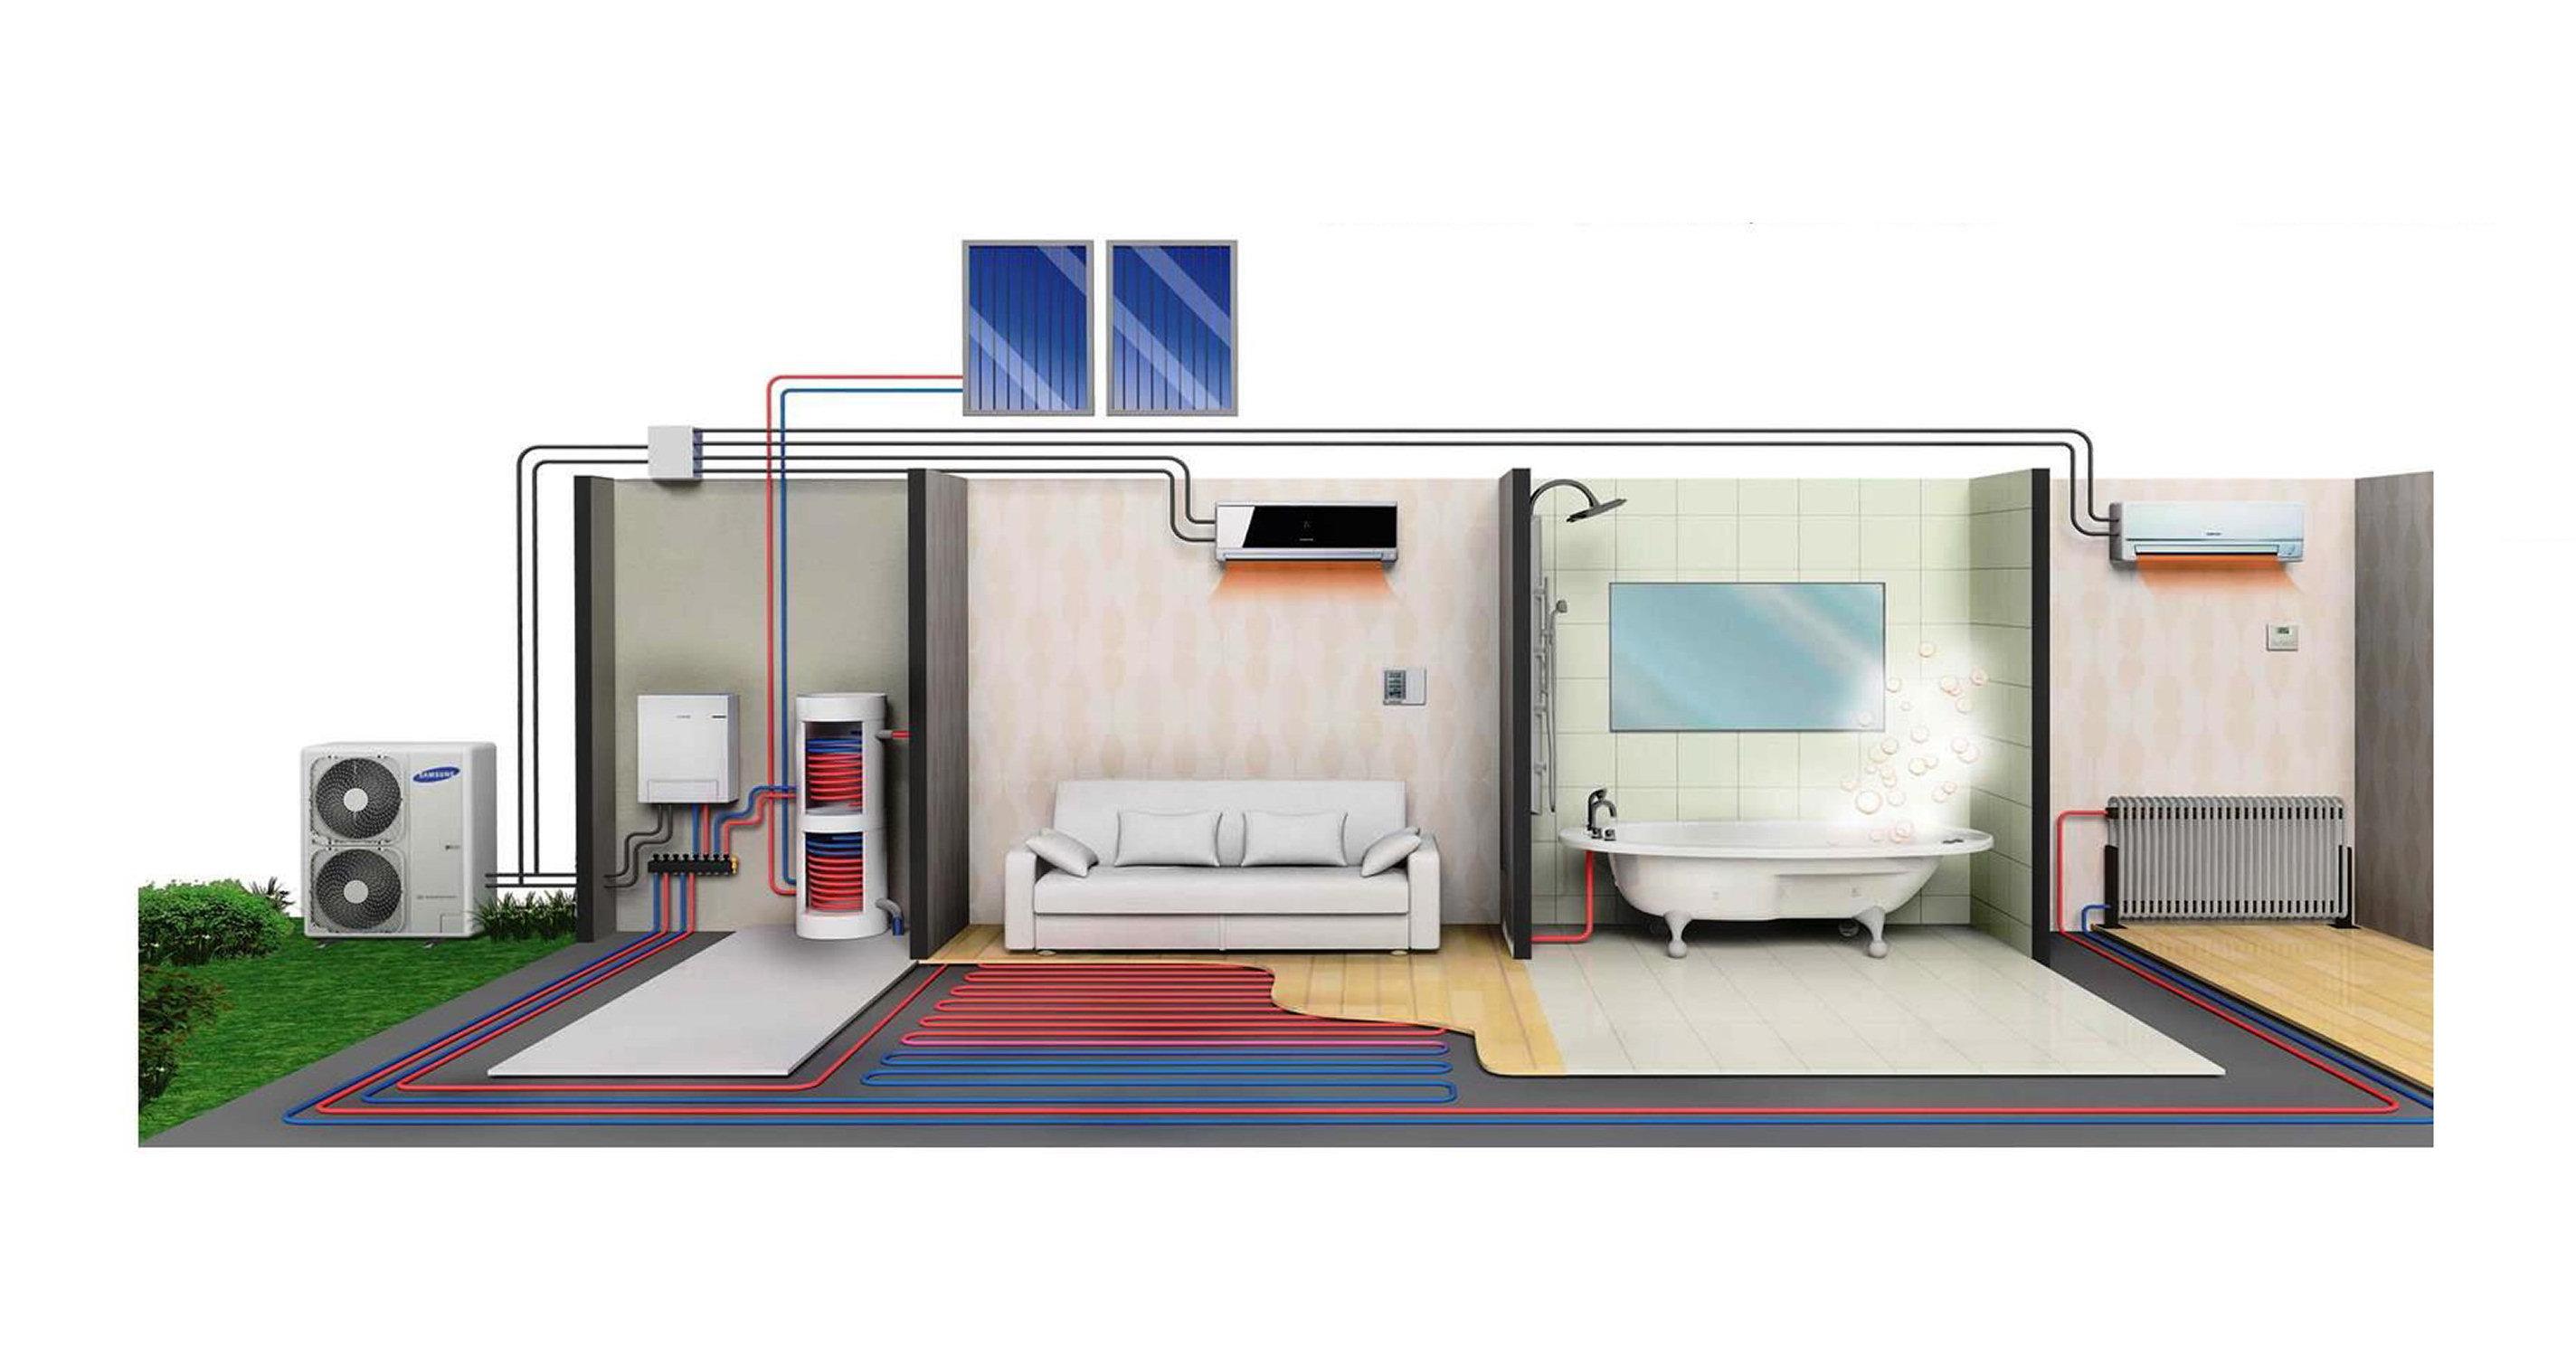 Ductless air conditioning systems rci riscaldamento - Riscaldamento aria canalizzata ...